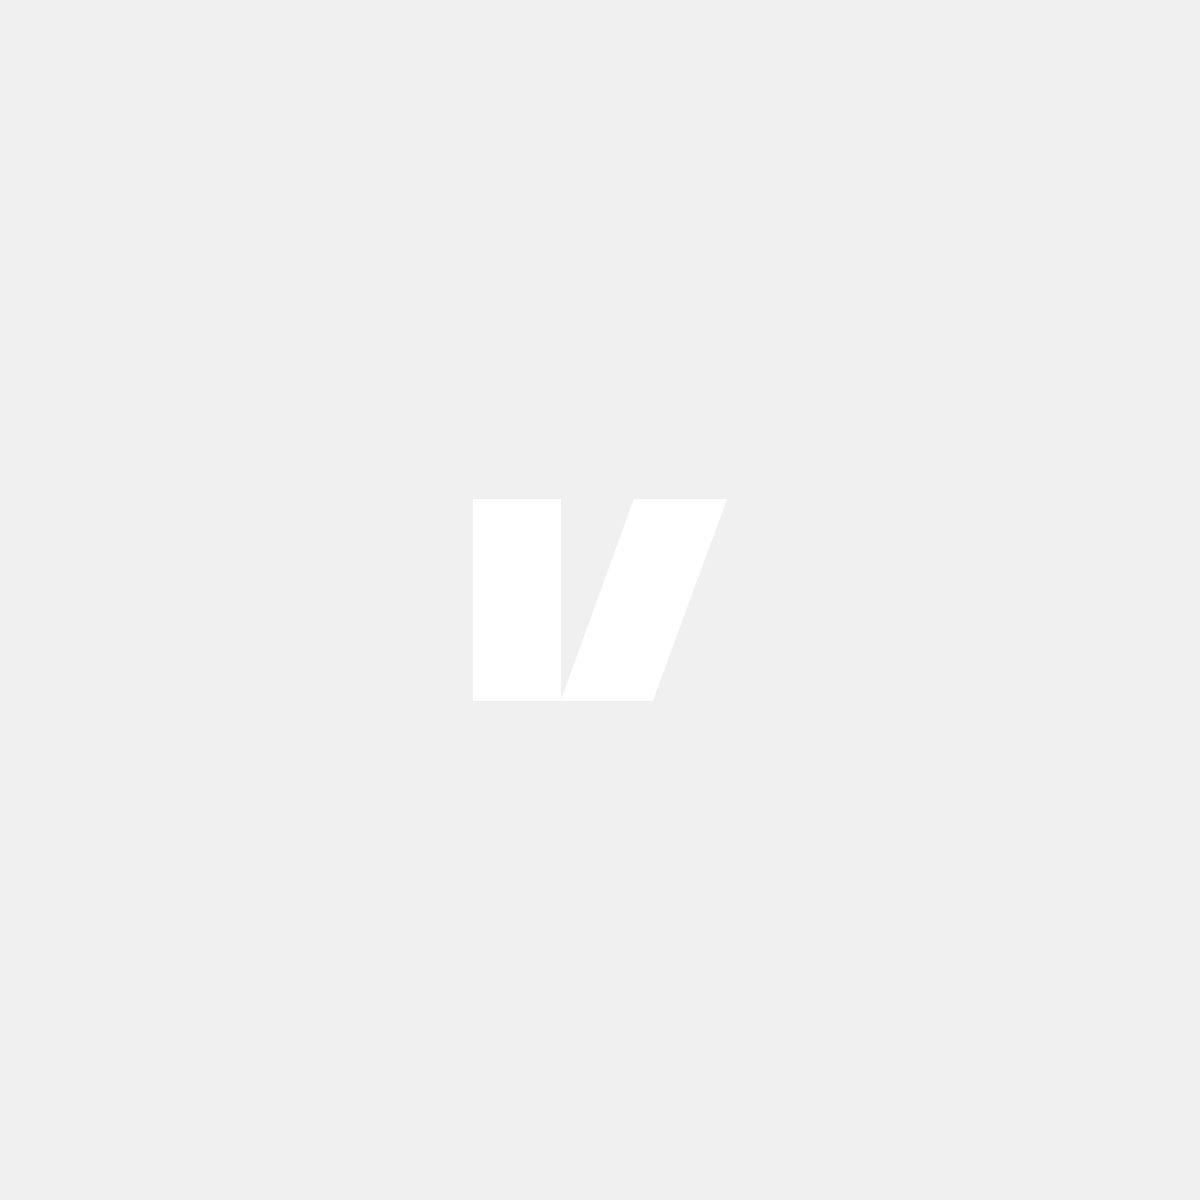 Tygmattor till Volvo V70, XC70 08-16, moccabrun